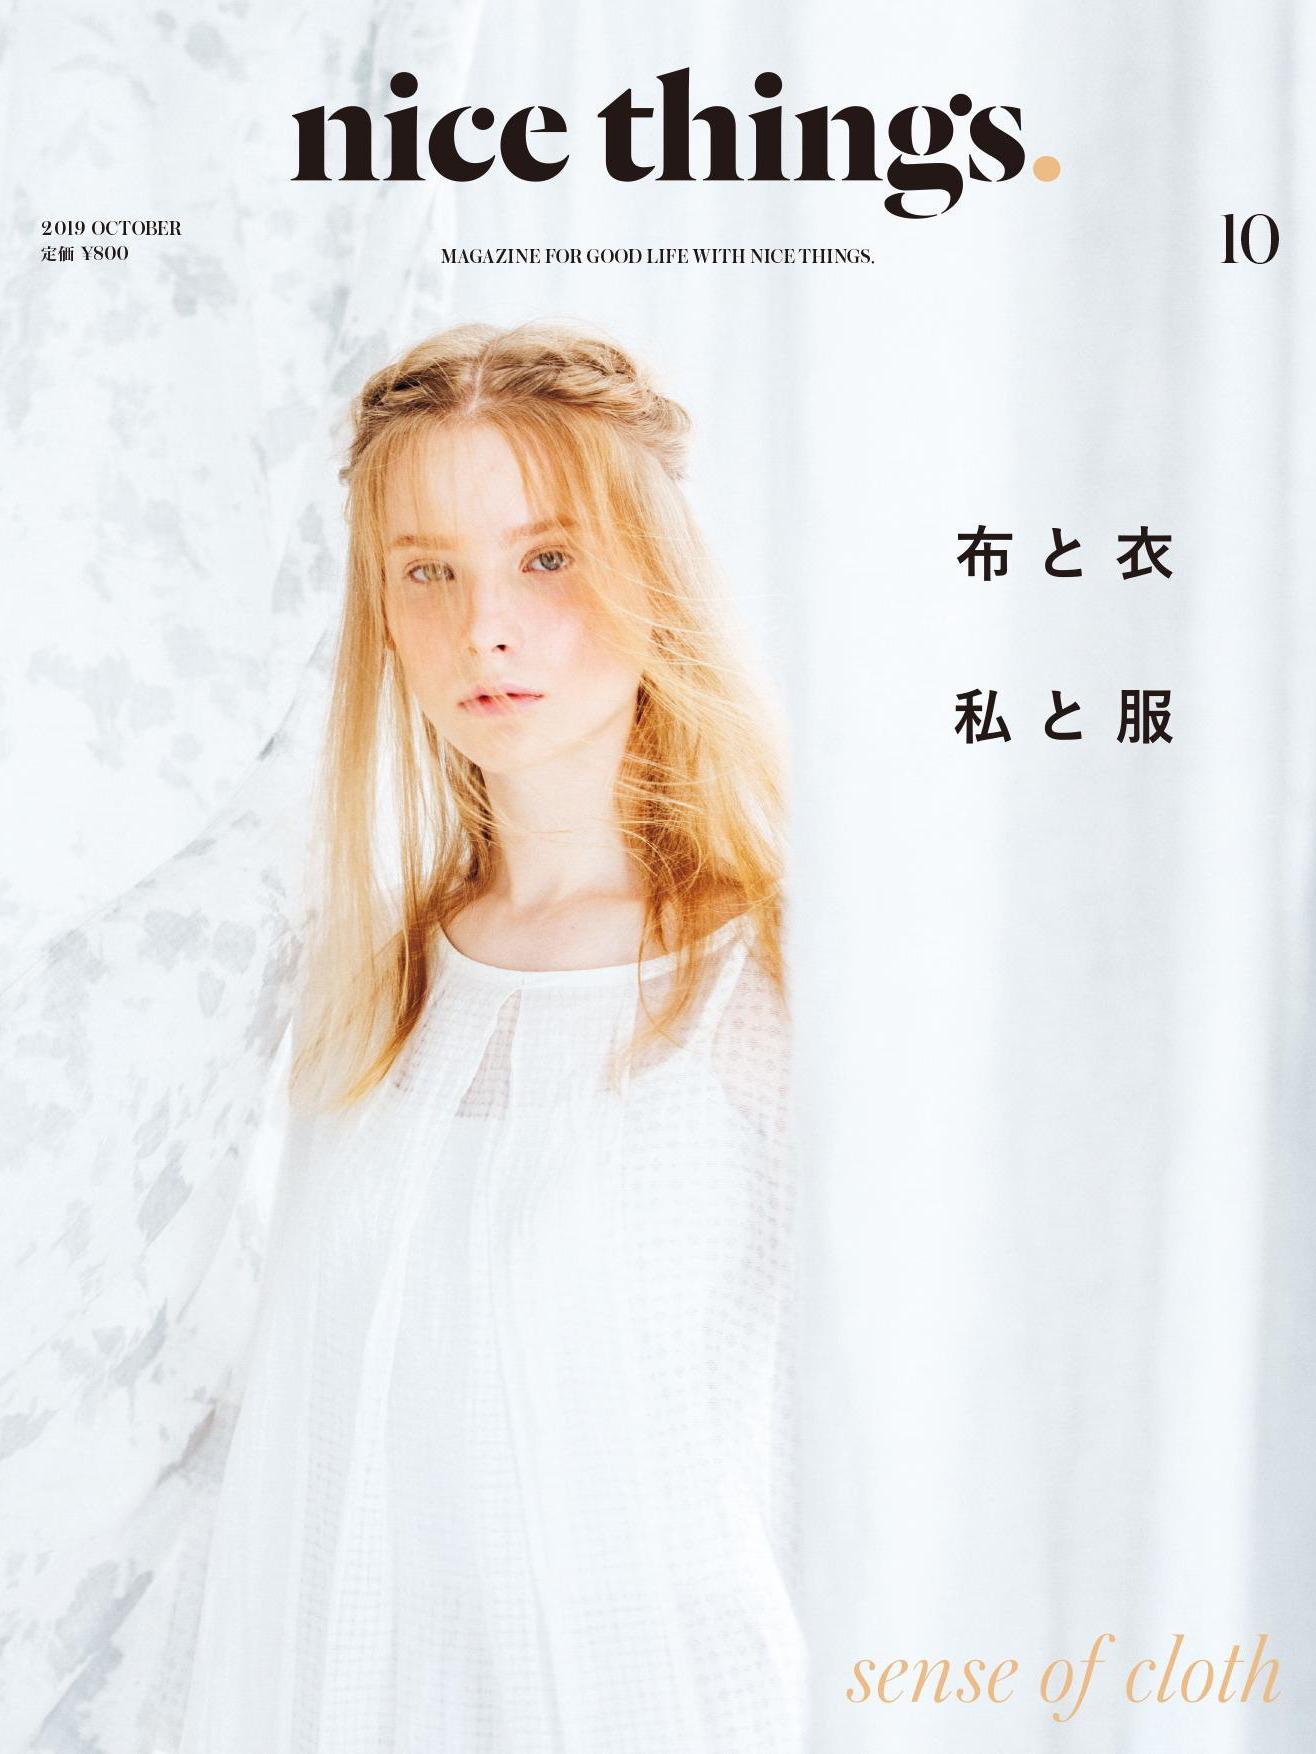 《nice things.》日本室内设计杂志2019年10月号